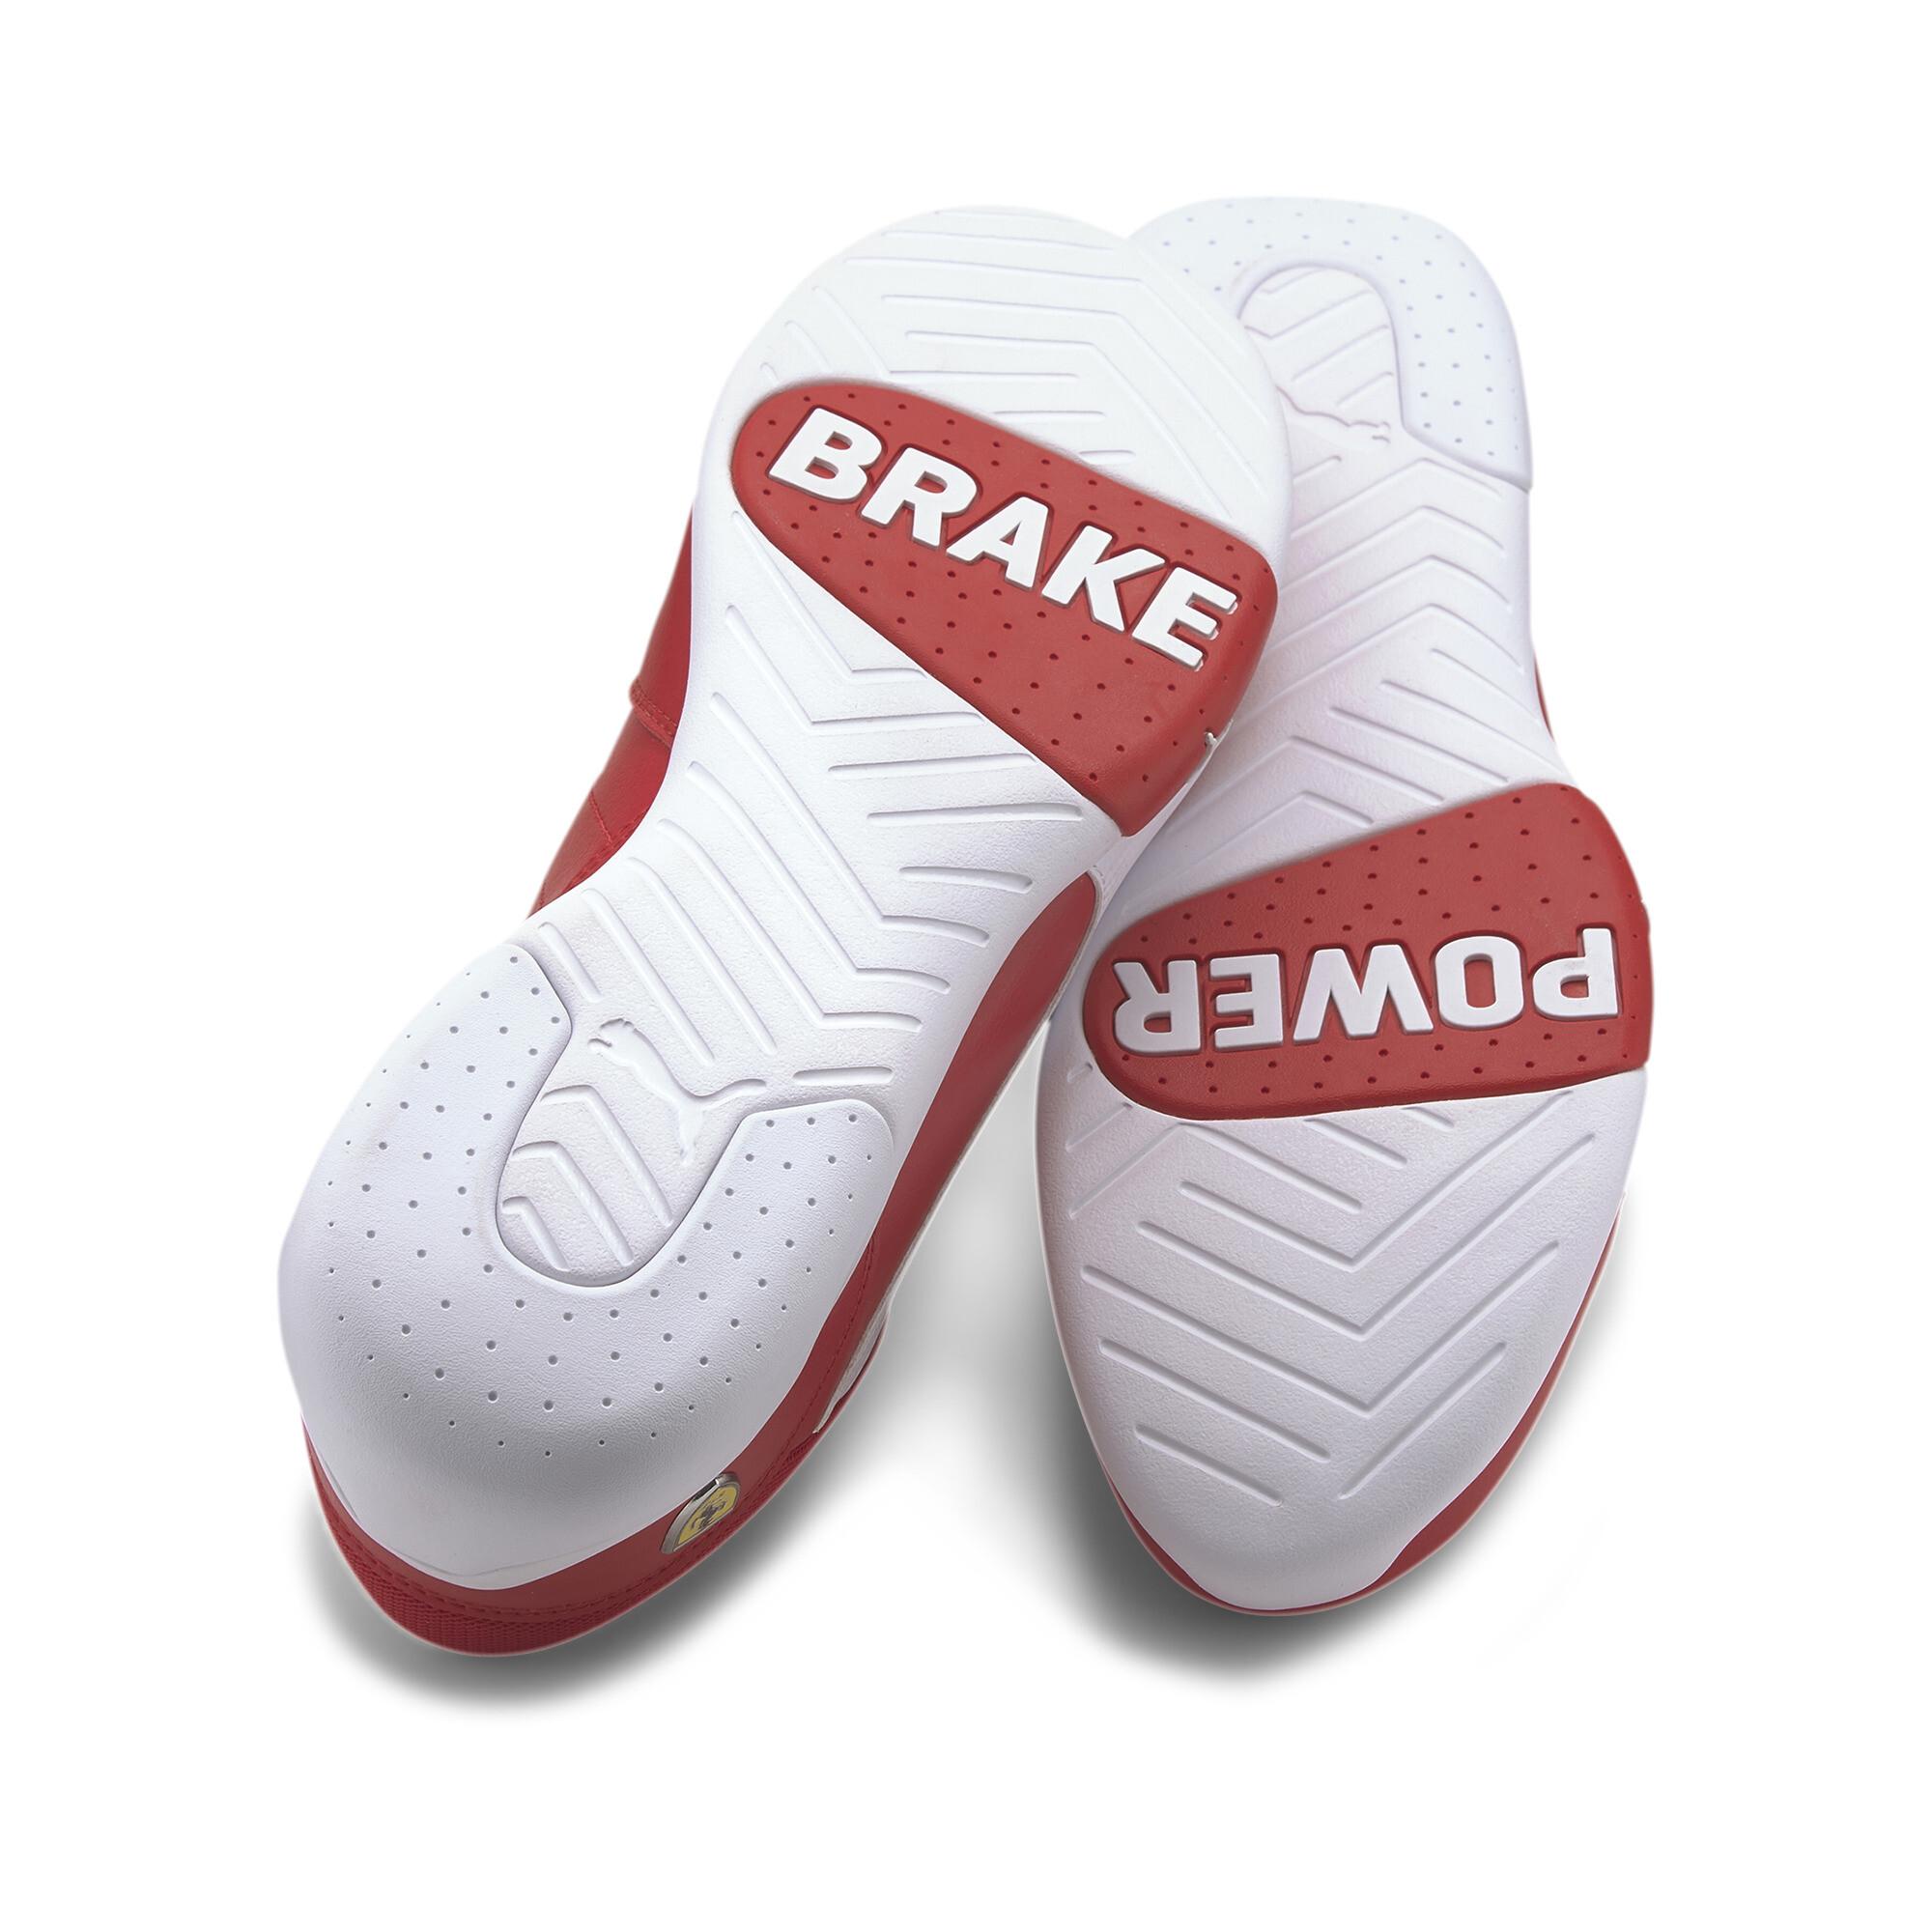 PUMA-Men-039-s-Scuderia-Ferrari-Kart-Cat-III-Motorsport-Shoes thumbnail 24